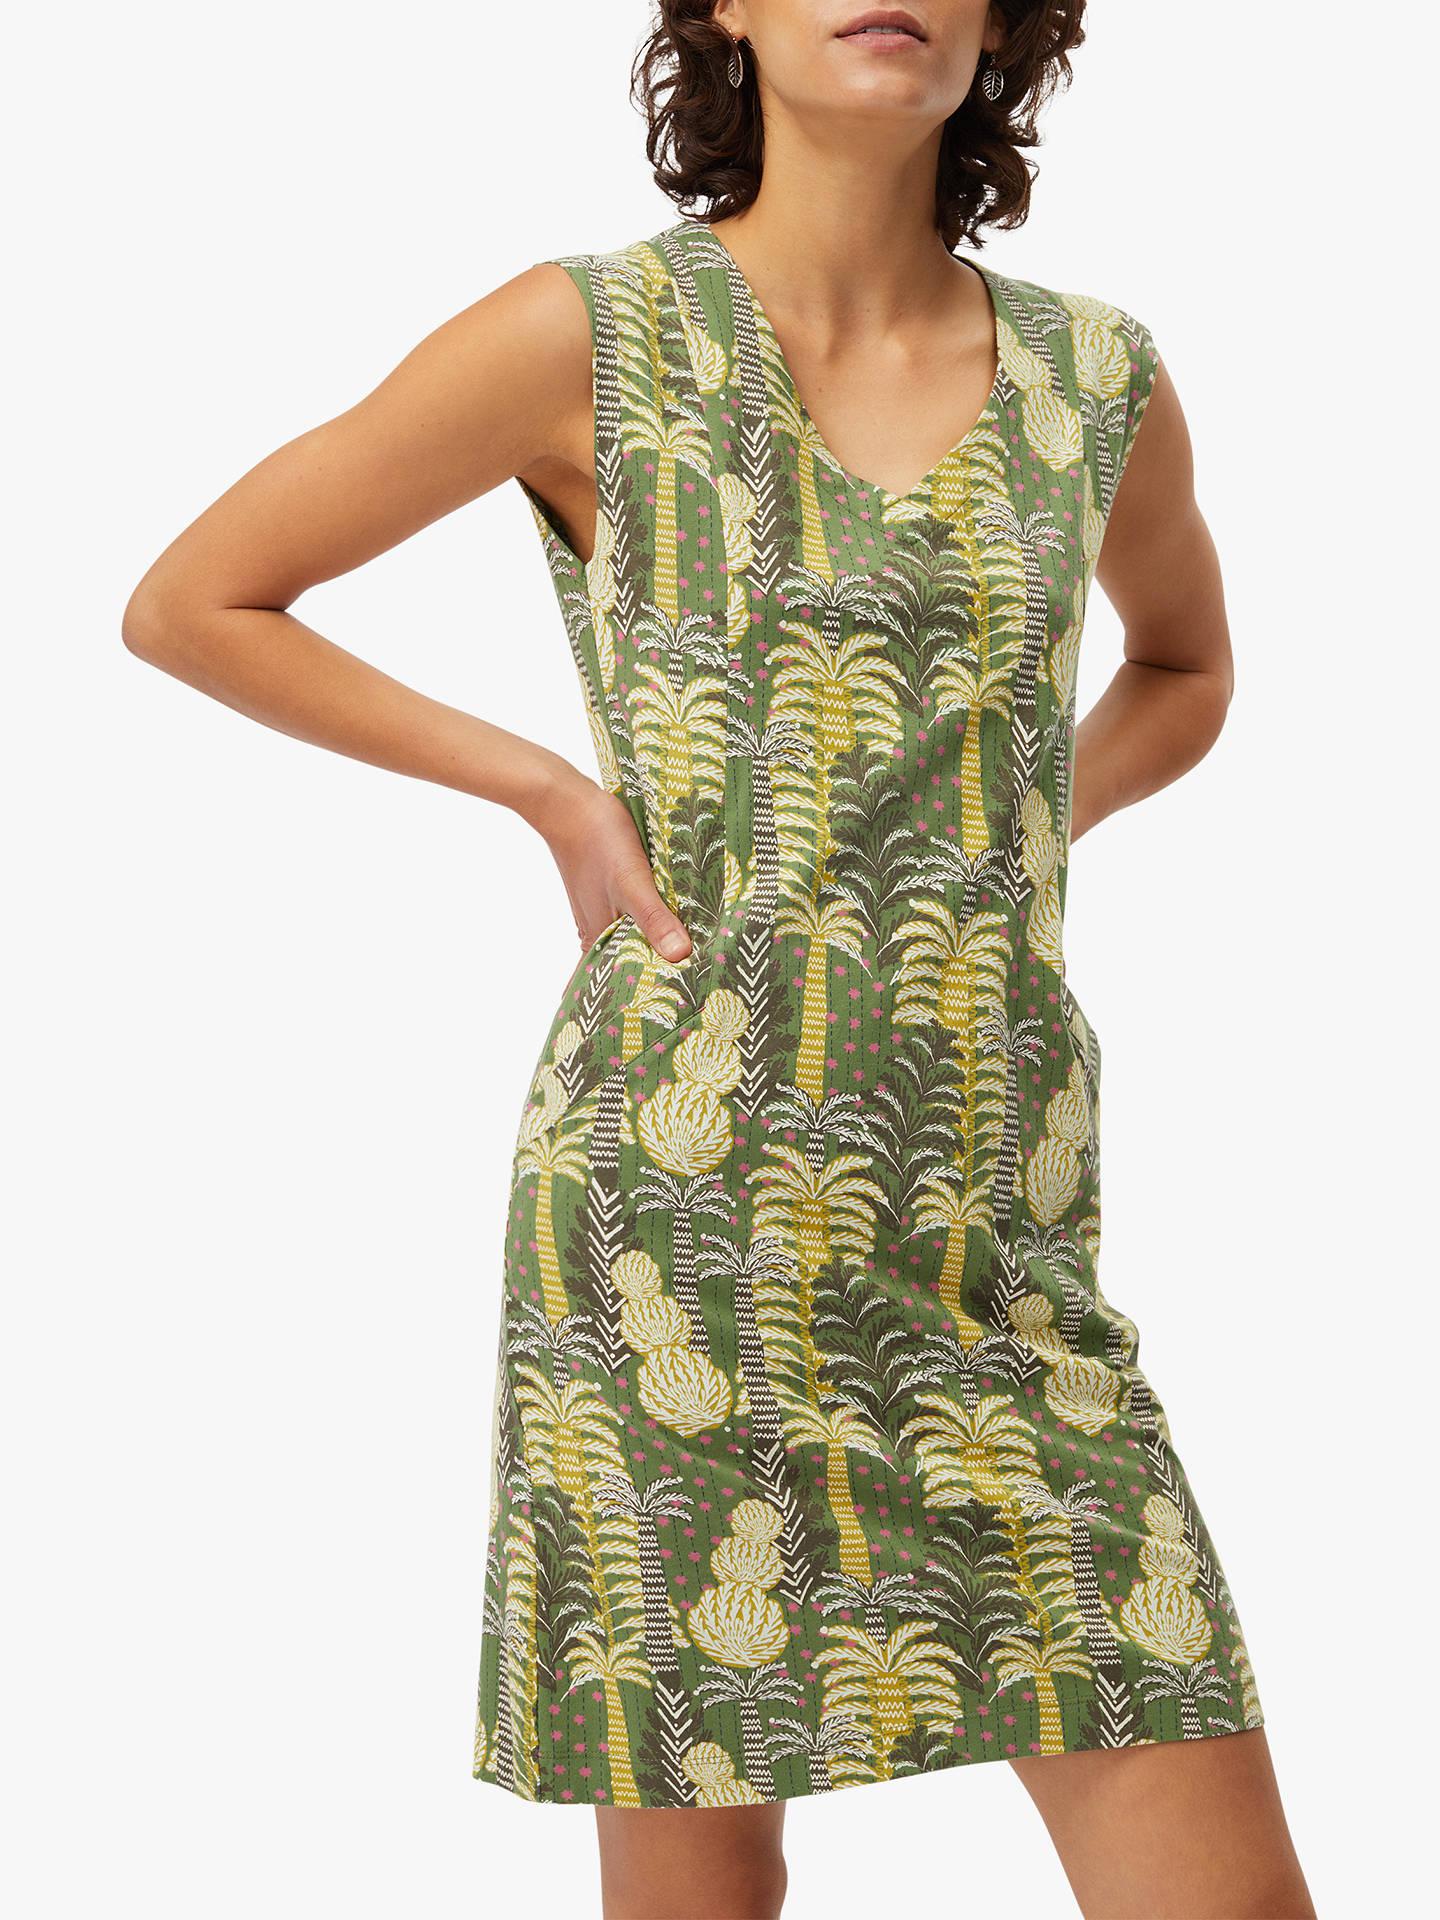 083306f0e8 Buy White Stuff Lena Cotton Dress, Green Multi, 6 Online at johnlewis.com  ...